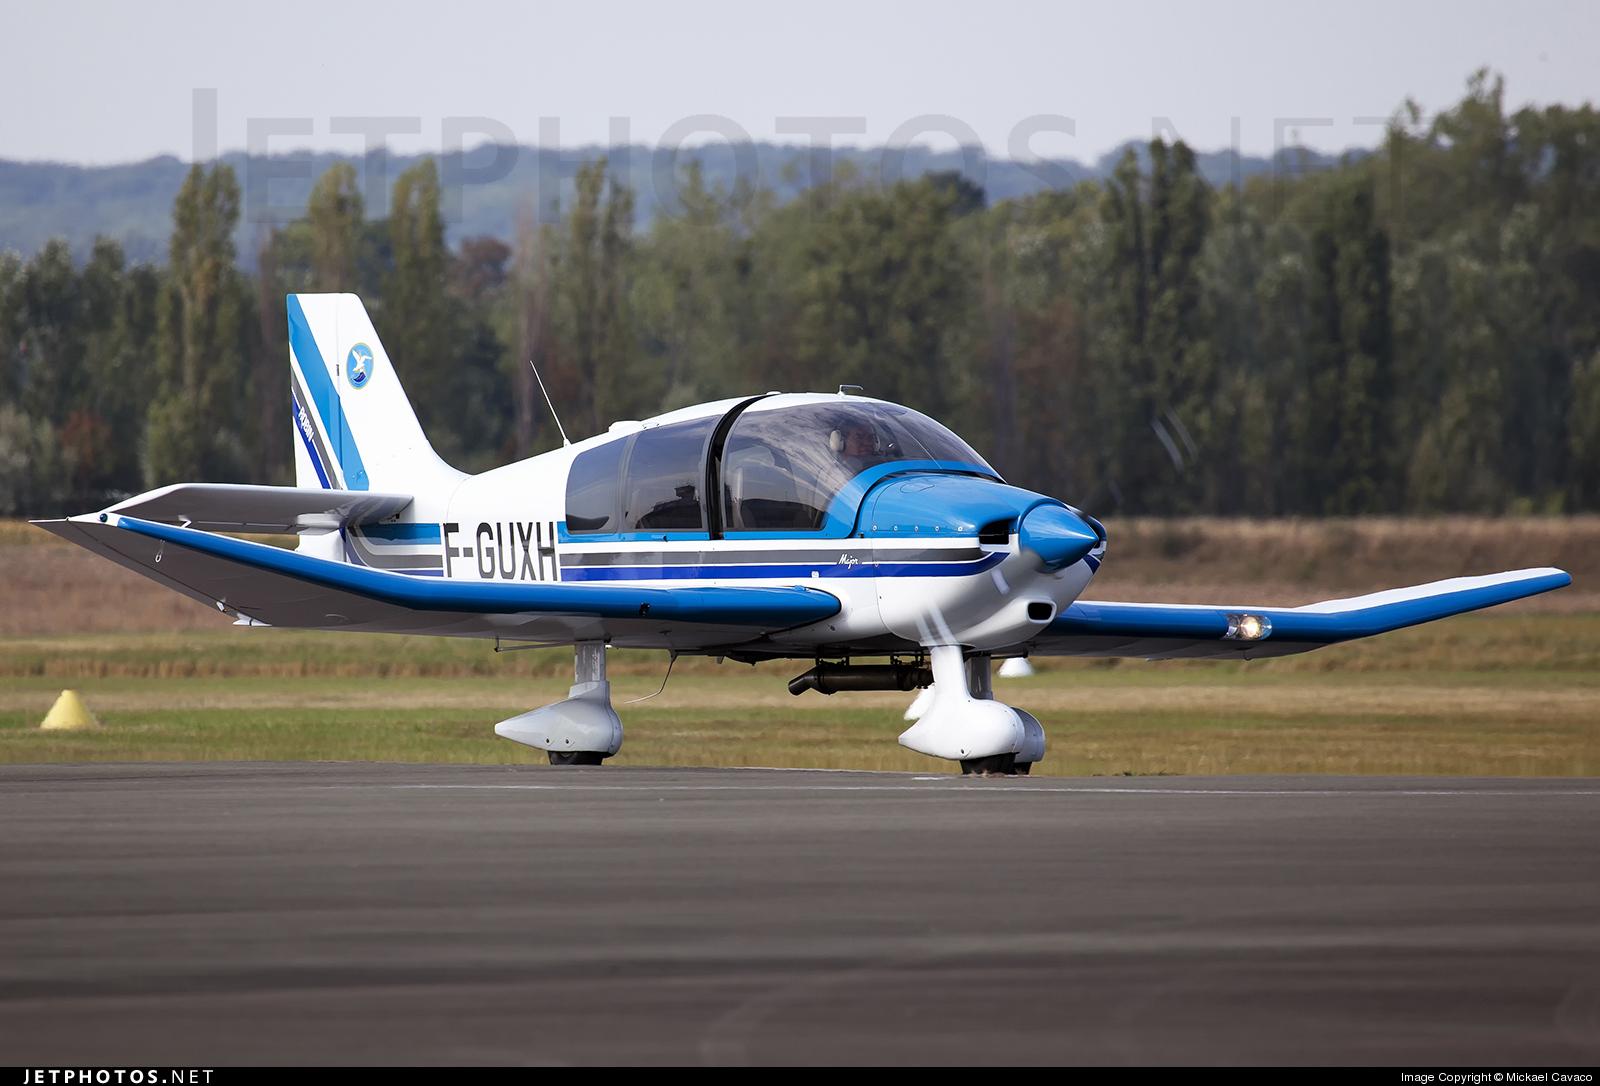 F-GUXH - Robin DR400/140B Major - Aéro-club Les Alcyons